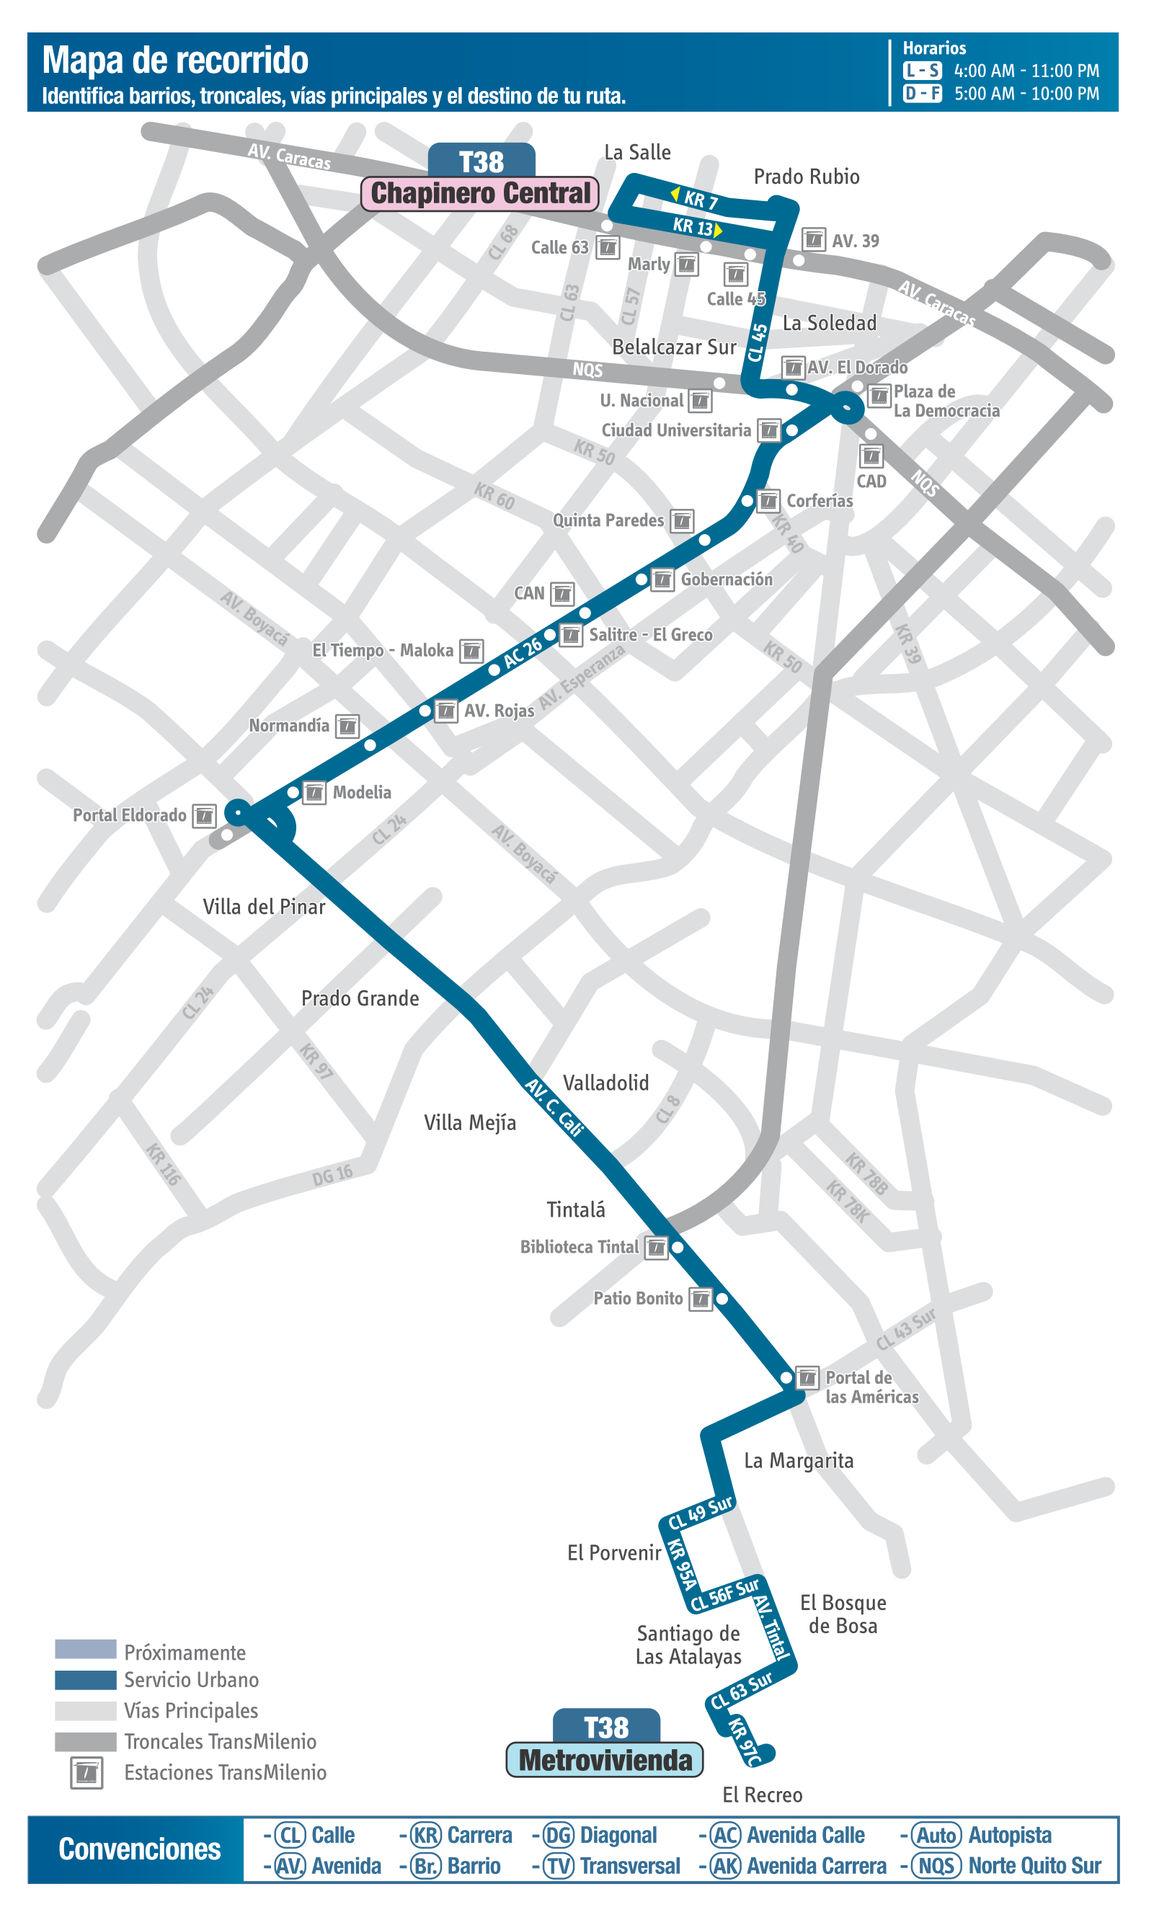 Ruta SITP: T38 Metrovivienda ↔ Chapinero Central [Urbana] 2